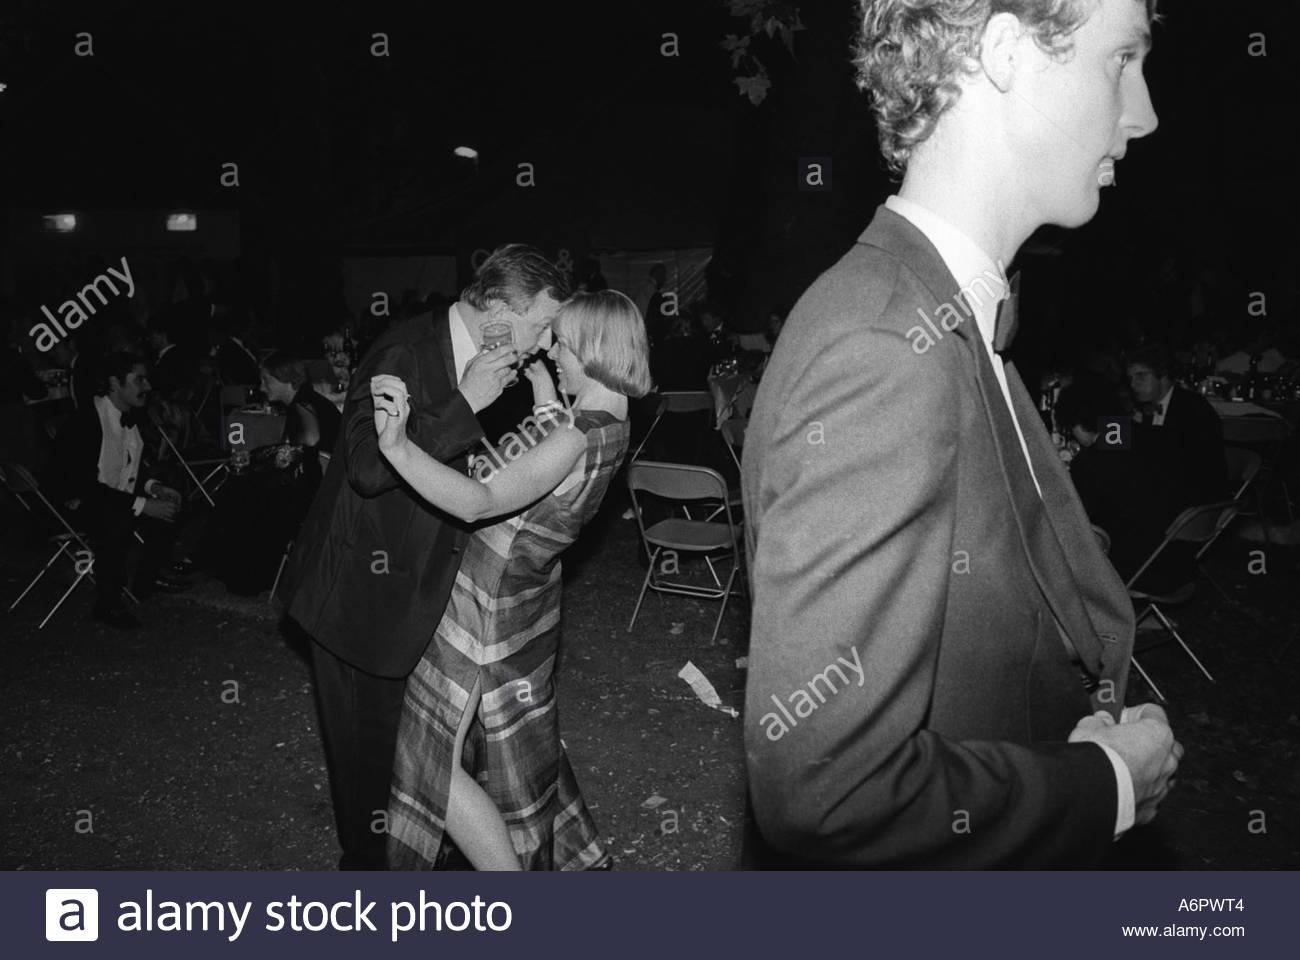 Berkley Square Ball London England 1981. - Stock Image